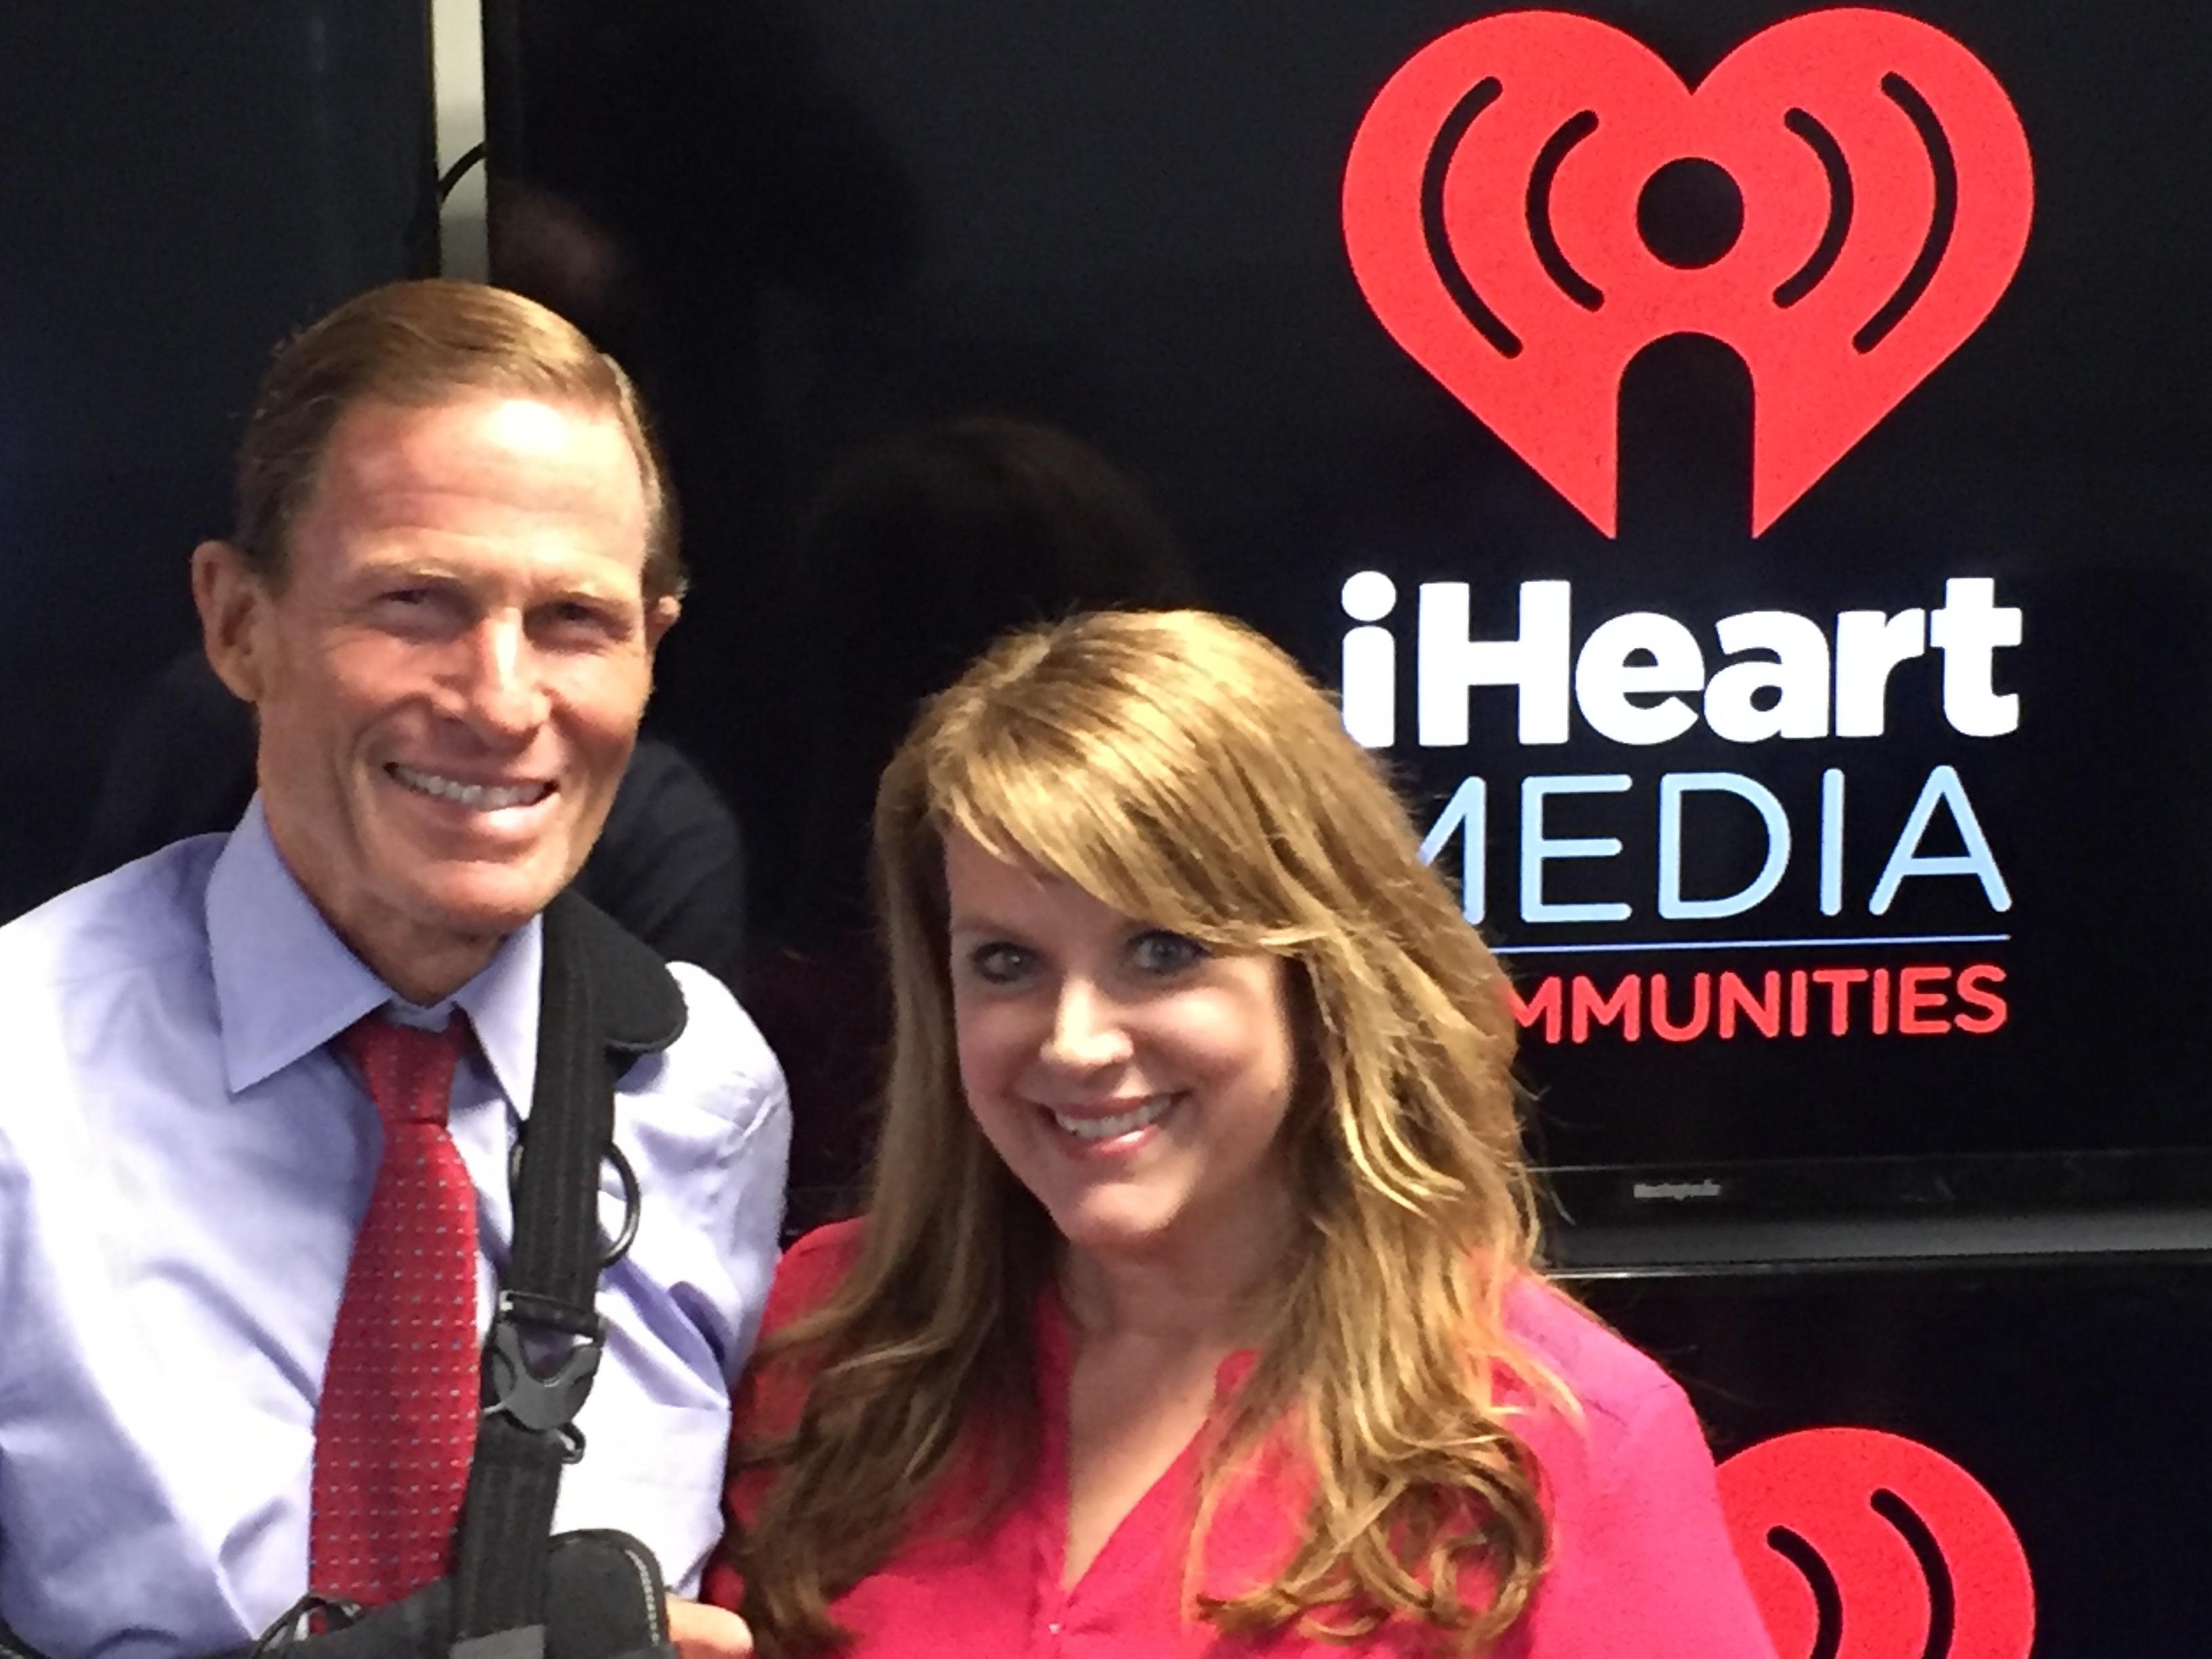 Senator Blumenthal and iHeart Media